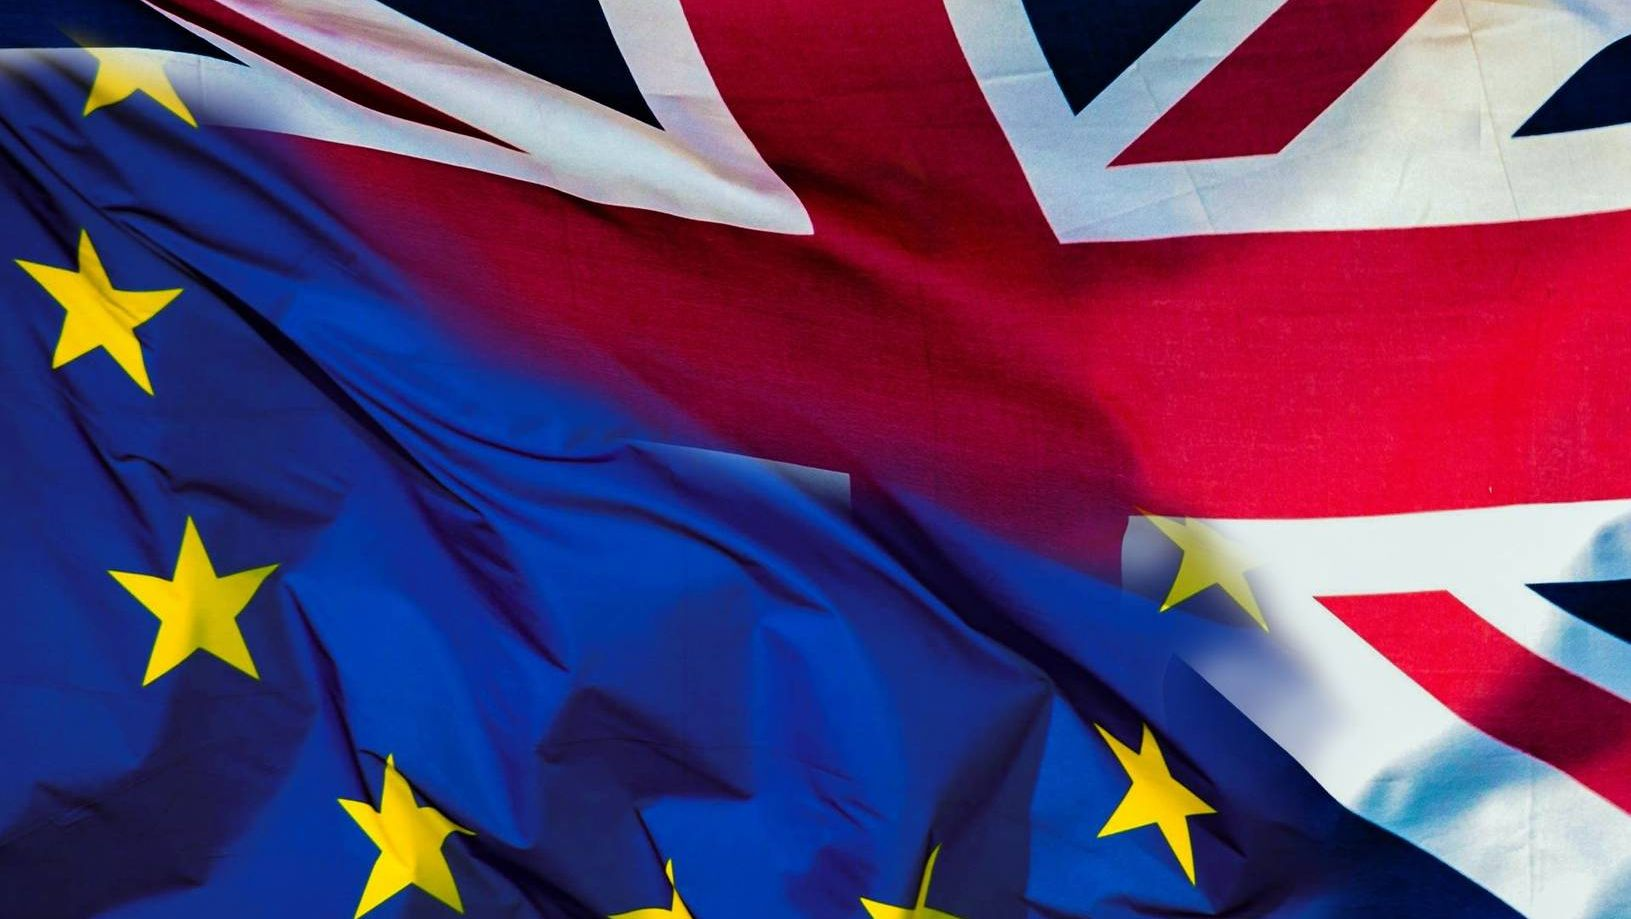 Brexit Free Stock Photo - Public Domain Pictures